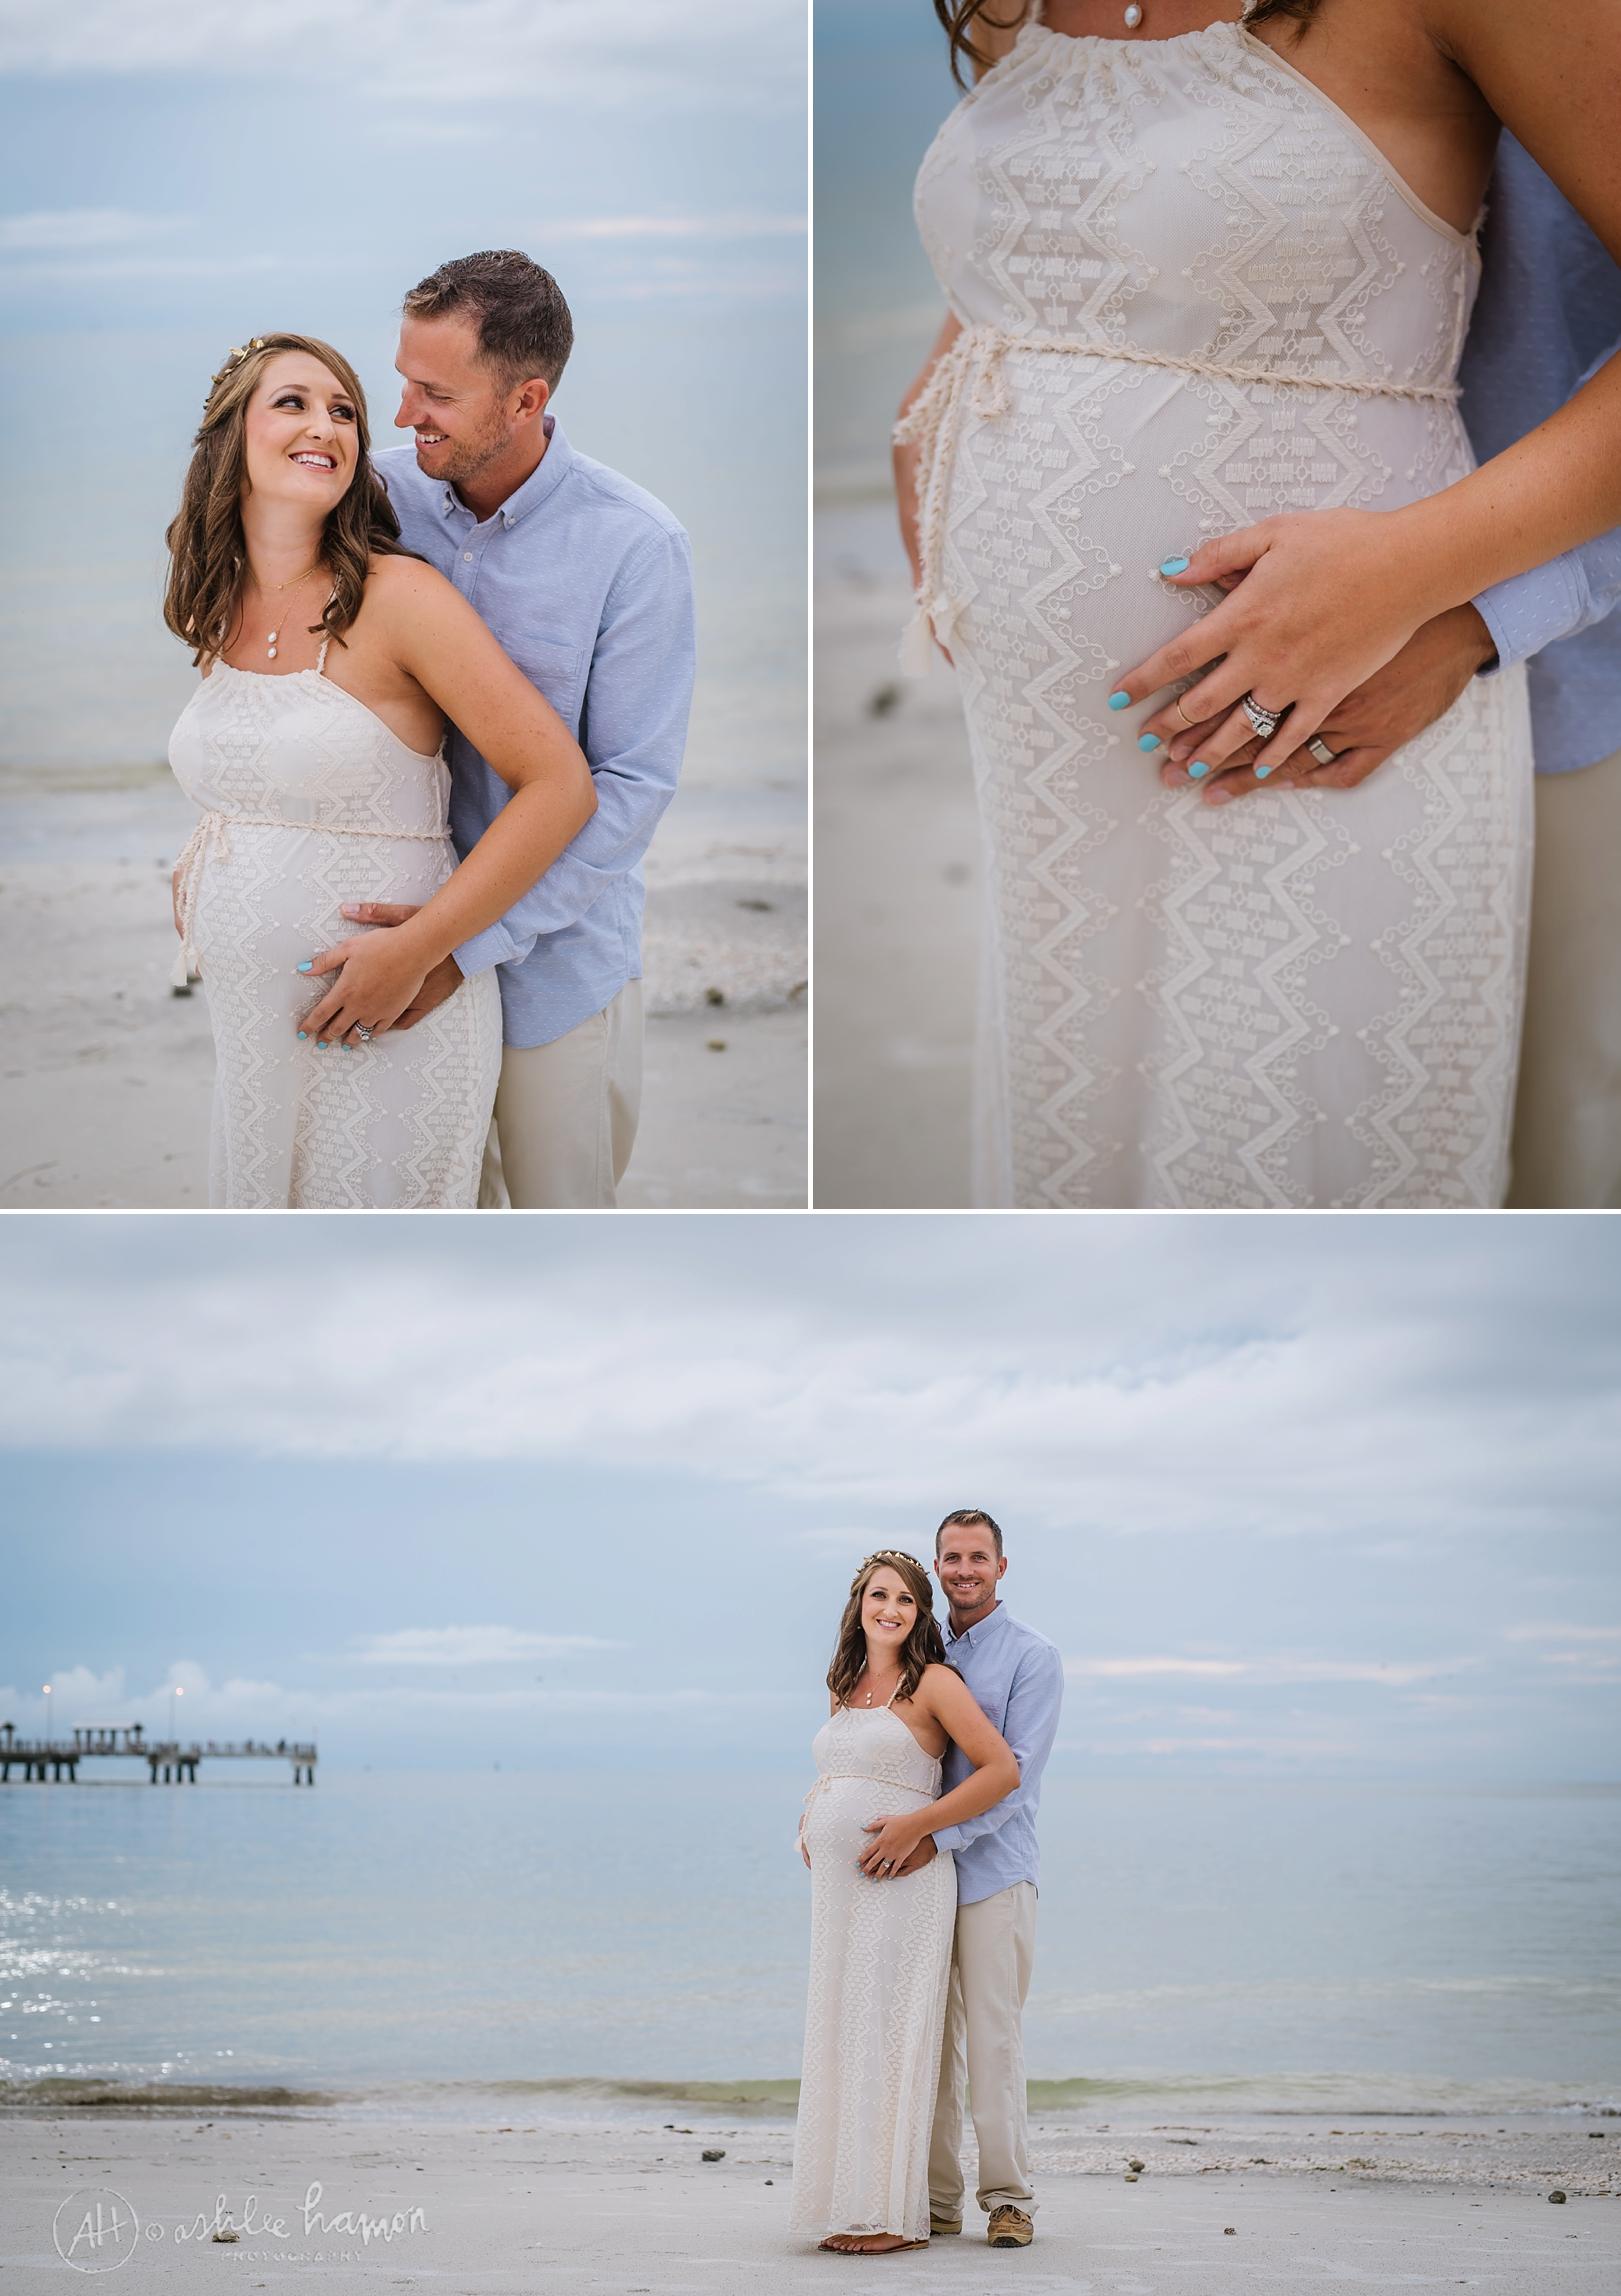 tampa-maternity-photography-ashlee-hamon-beach_0000.jpg